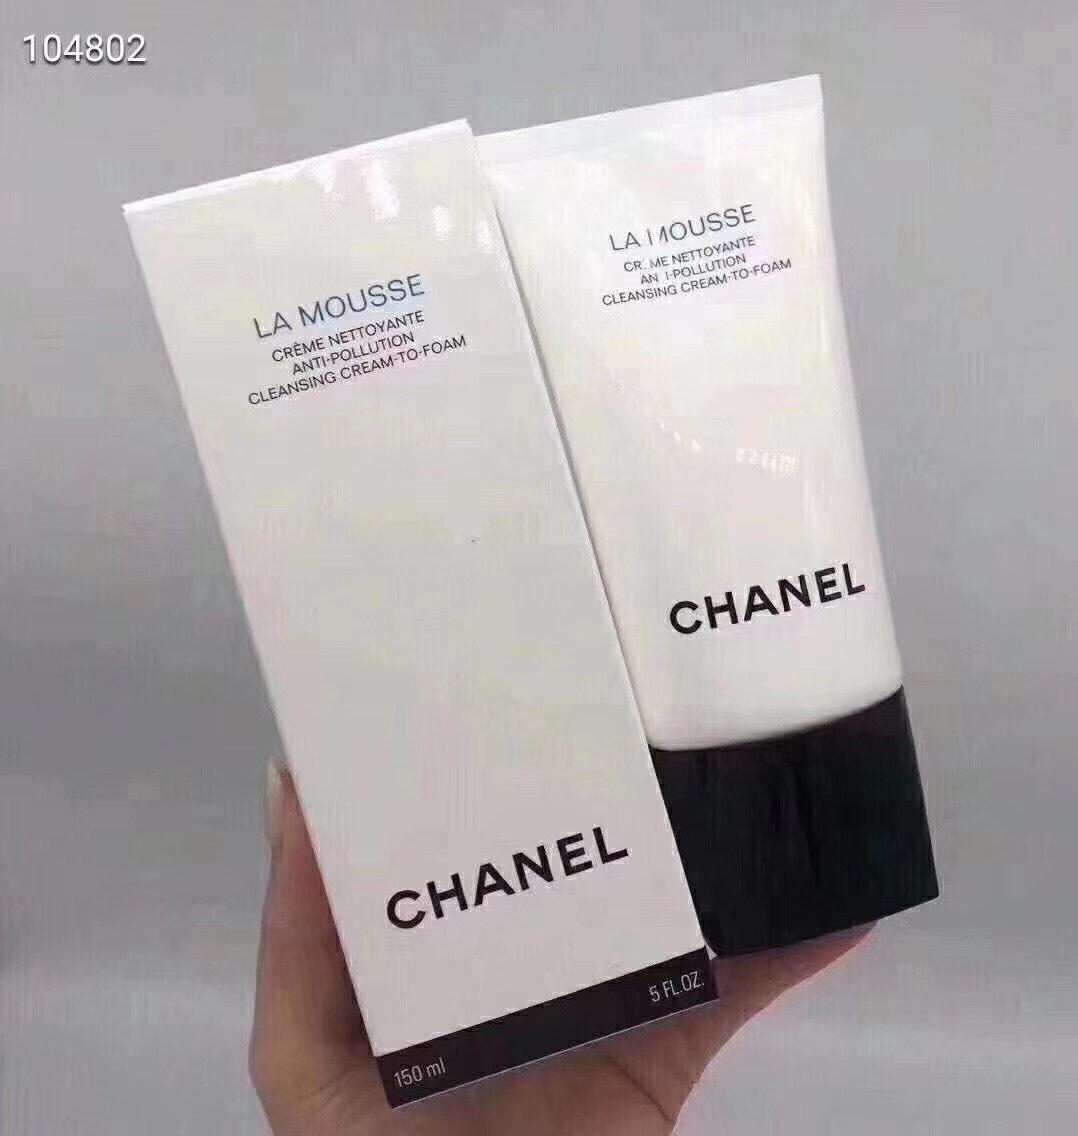 CHANEL La Mousse Anti-Pollution CleansingCream-To-Foam 150ml.ครีมทำความสะอาดผิวที่แปรเปลี่ยน